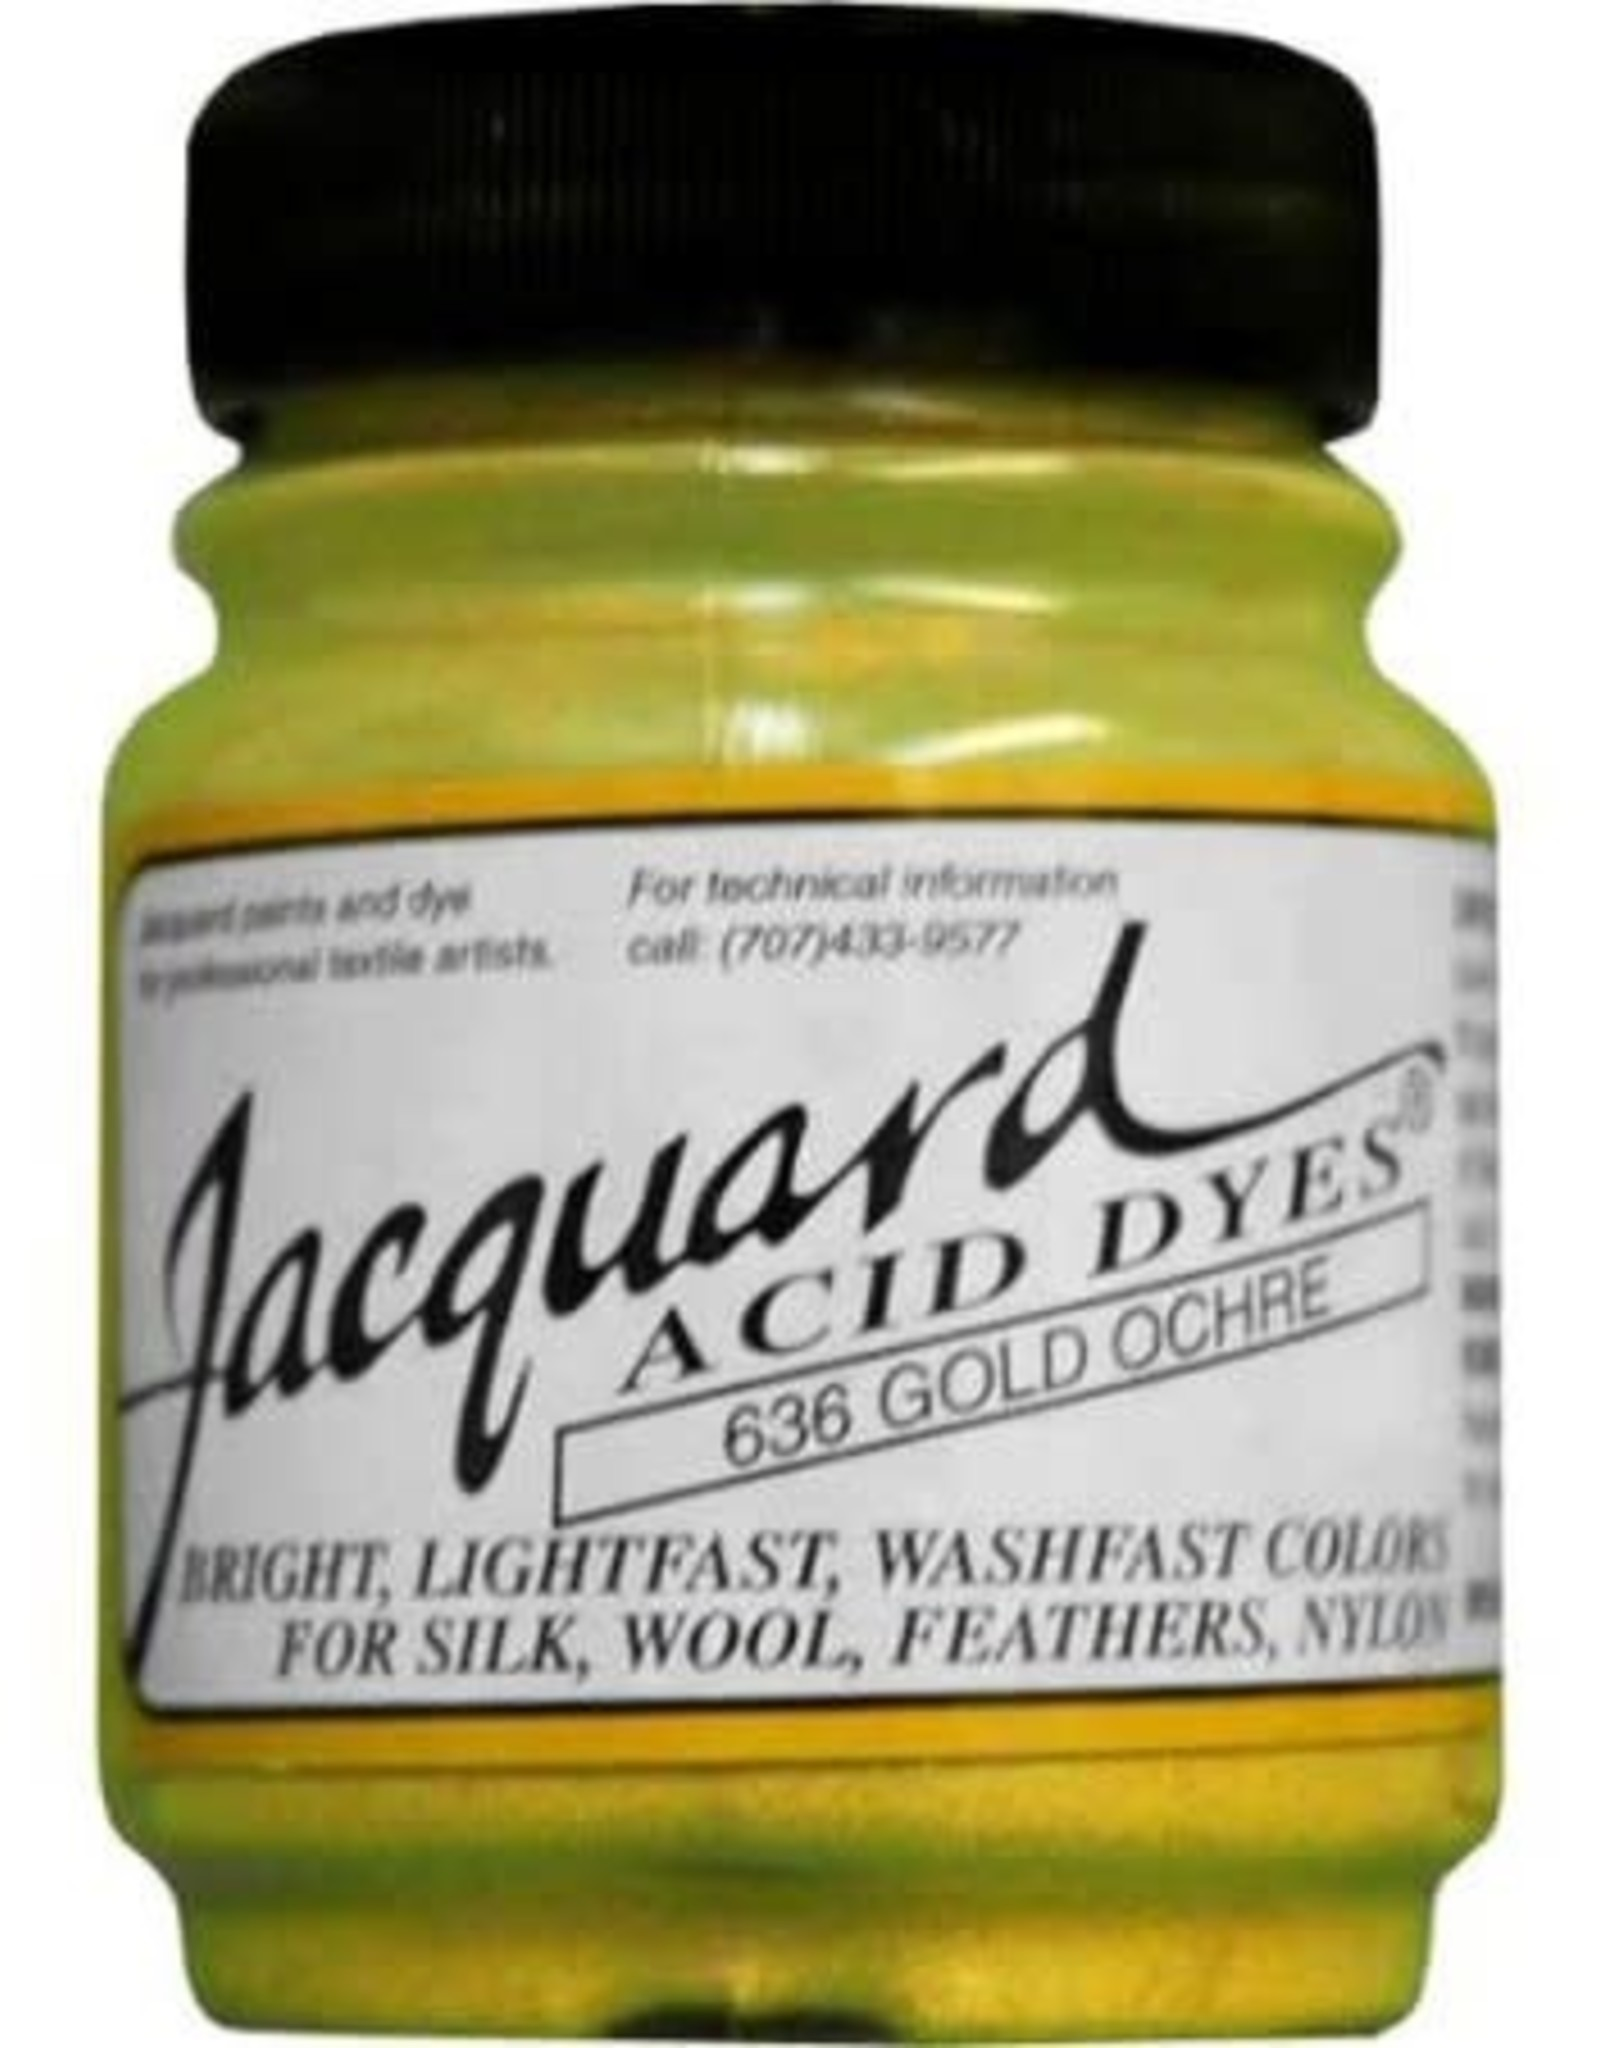 Jacquard Jacquard Acid Dye Oker, Goud